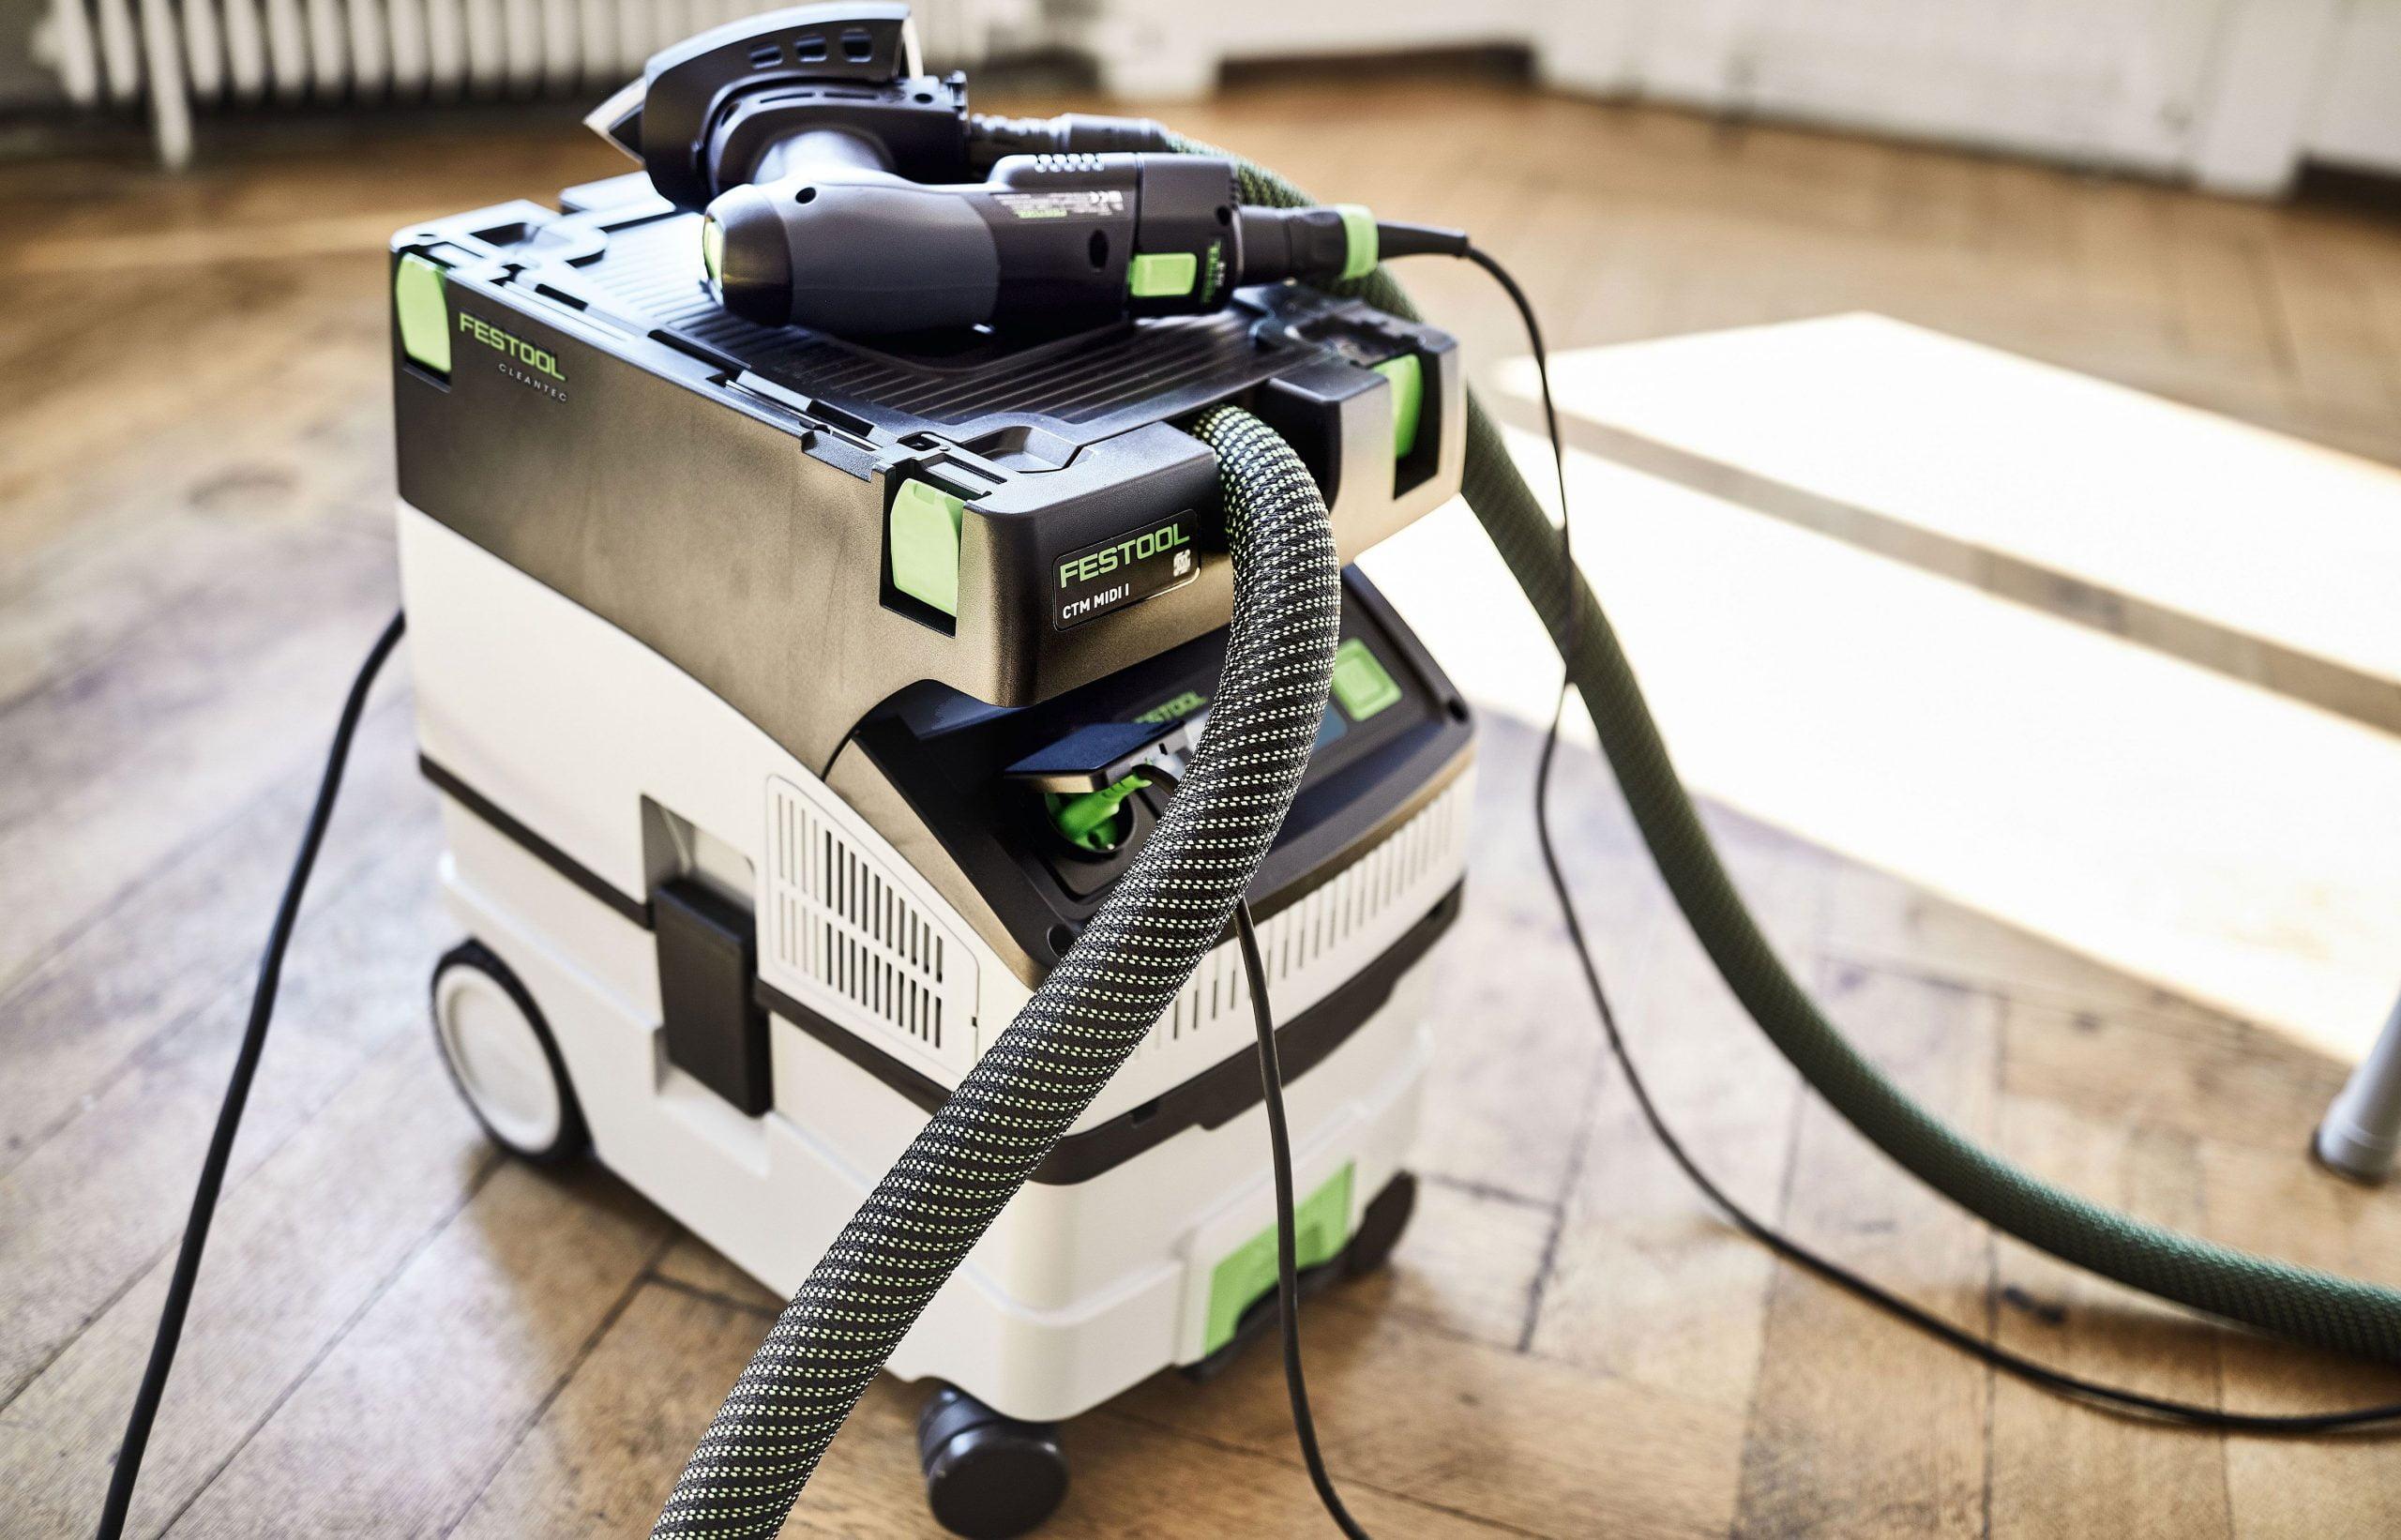 CTM MIDI HEPA for woodworking and other hazardous dust